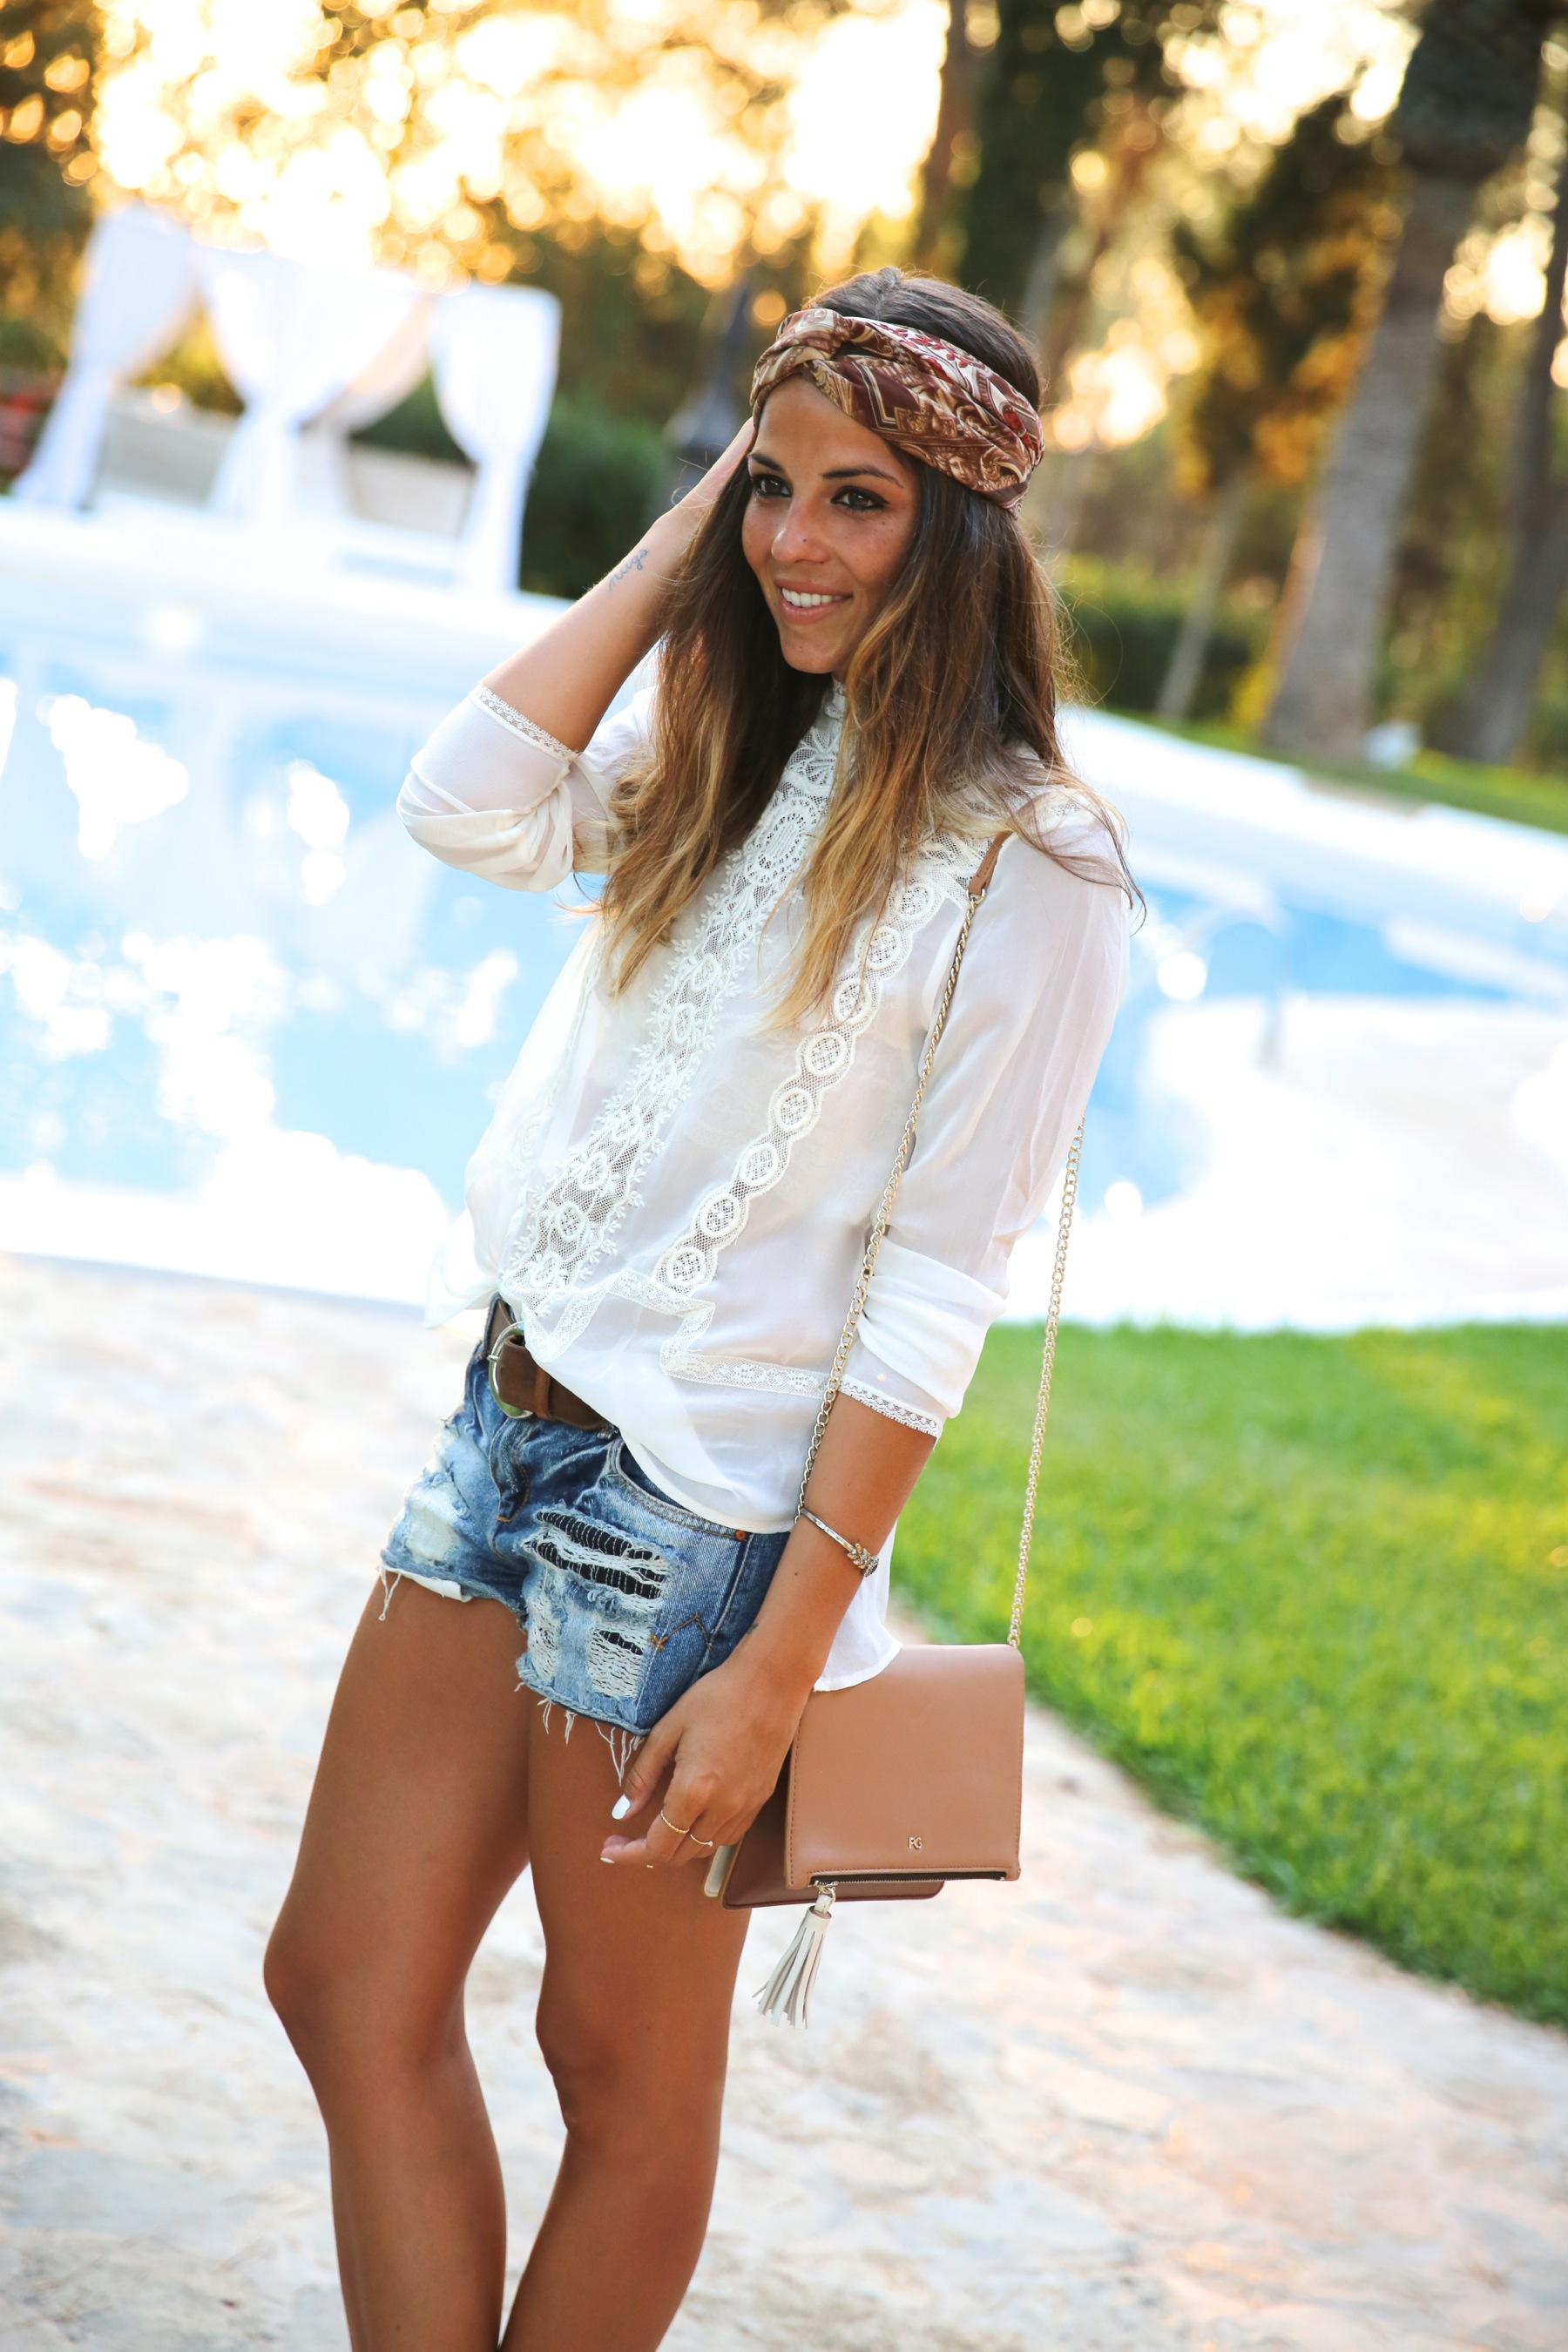 trendy_taste-look-outfit-street_style-ootd-blog-blogger-fashion_spain-moda_españa-boho-hippie-denim_shorts-shorts_vaqueros-blusa-blouse-mas34-pg-ibiza-sa_talaia-8